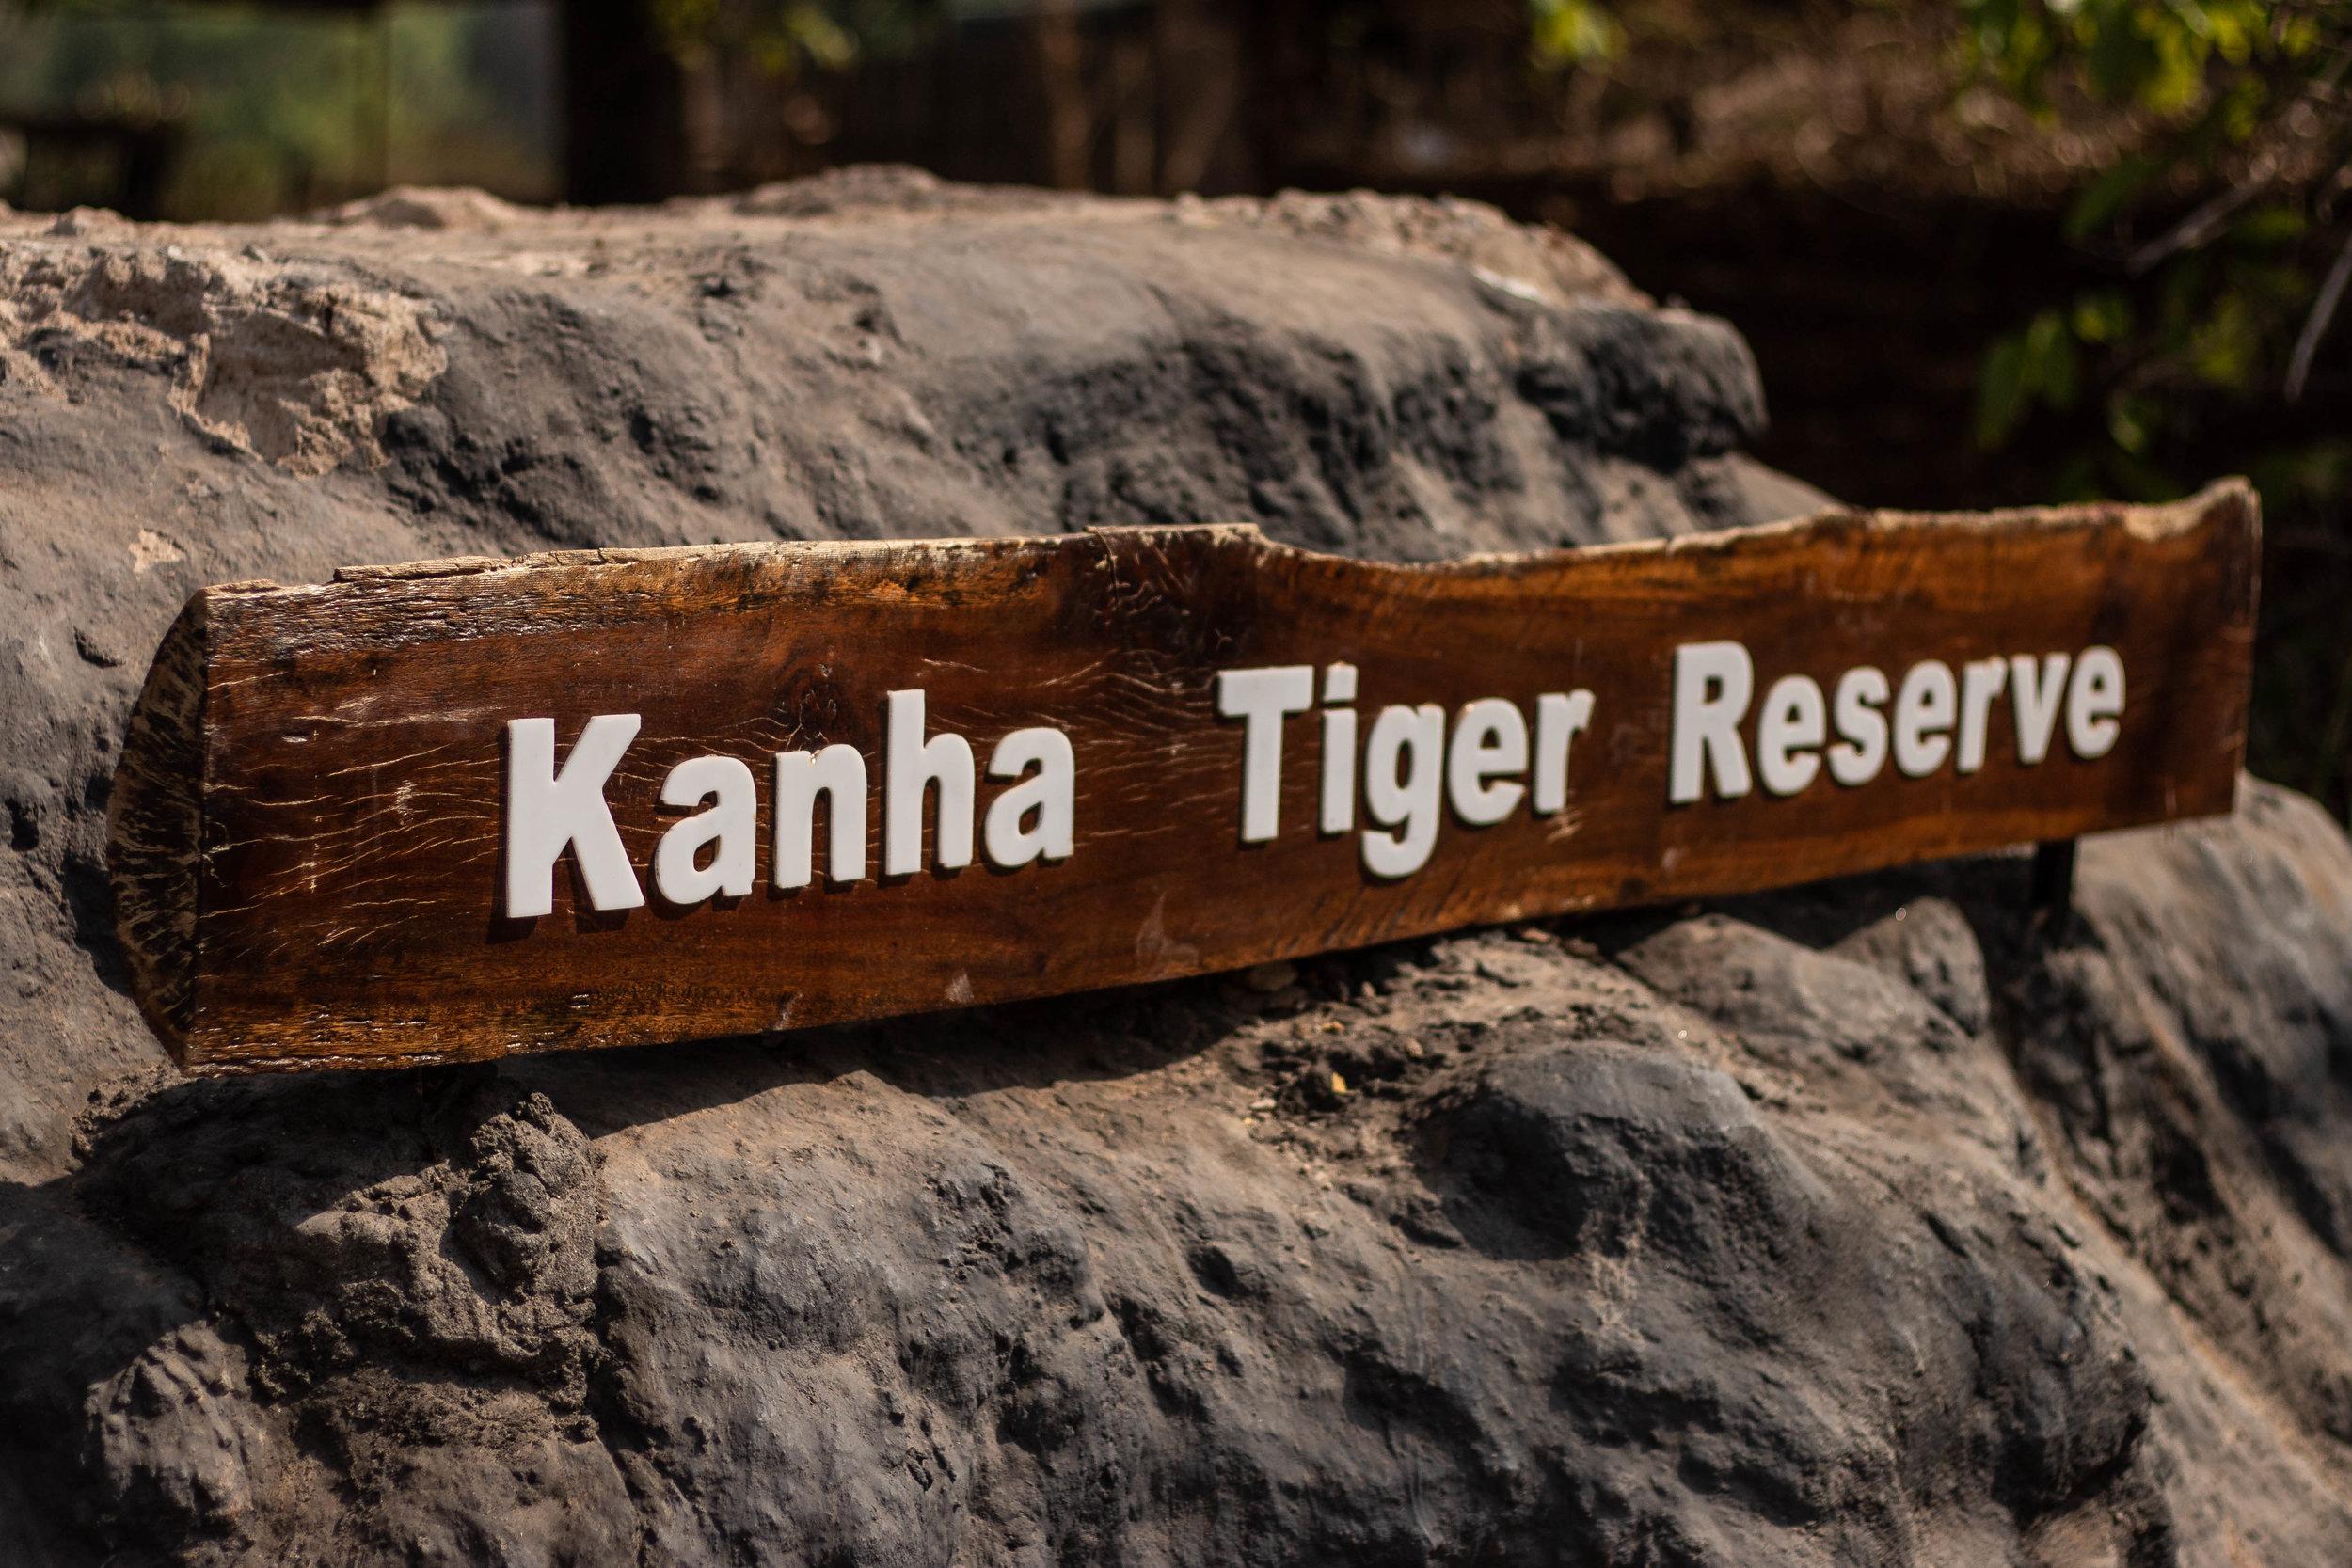 Kanha National Park and Tiger Reserve